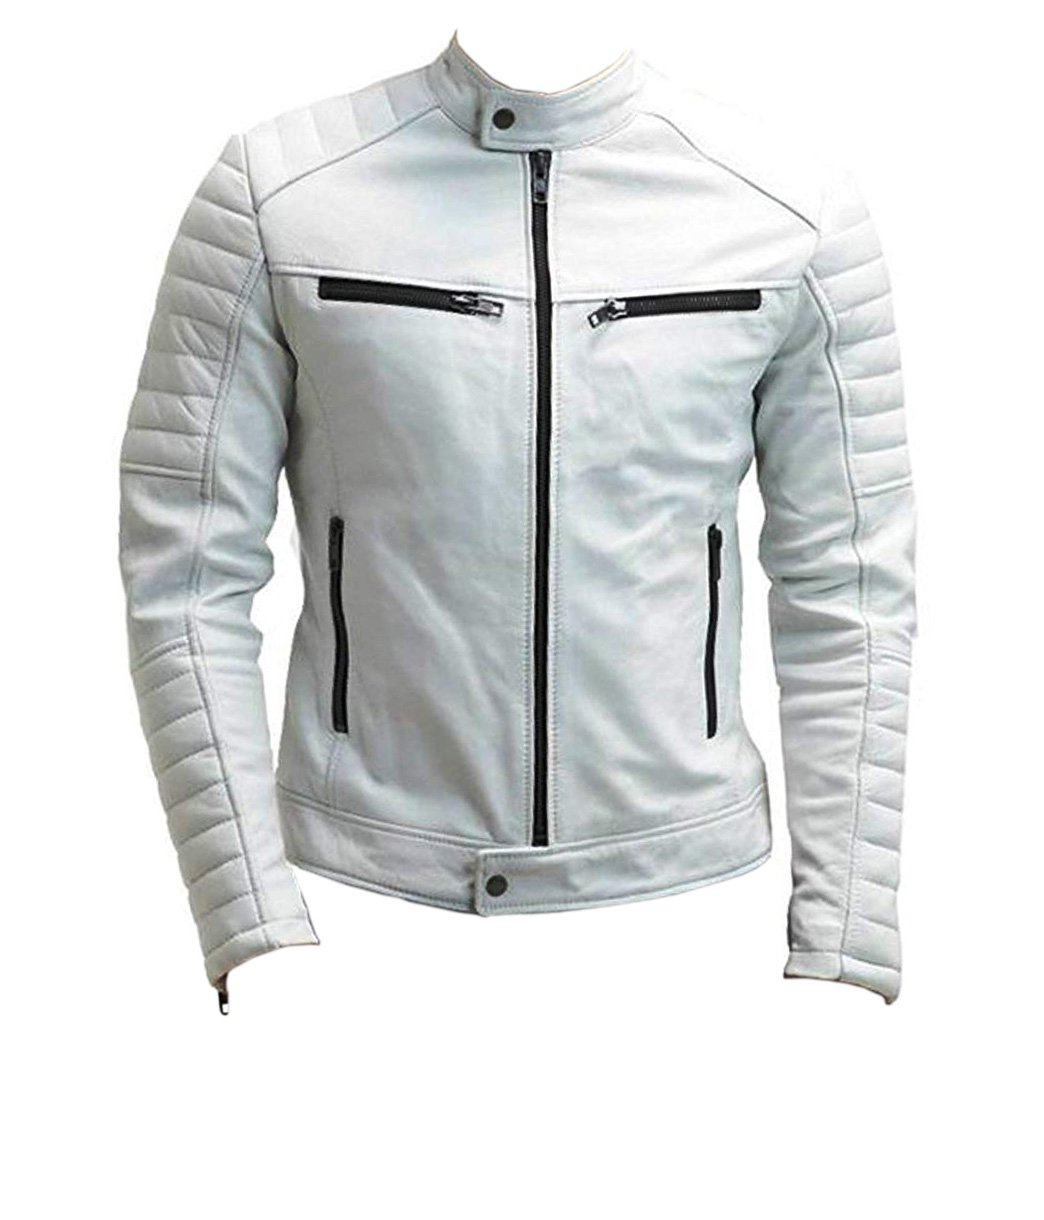 NEW MEN,S FASHION LEATHER MOTORCYCLE WHITE JACKET JC67756 SIZE L